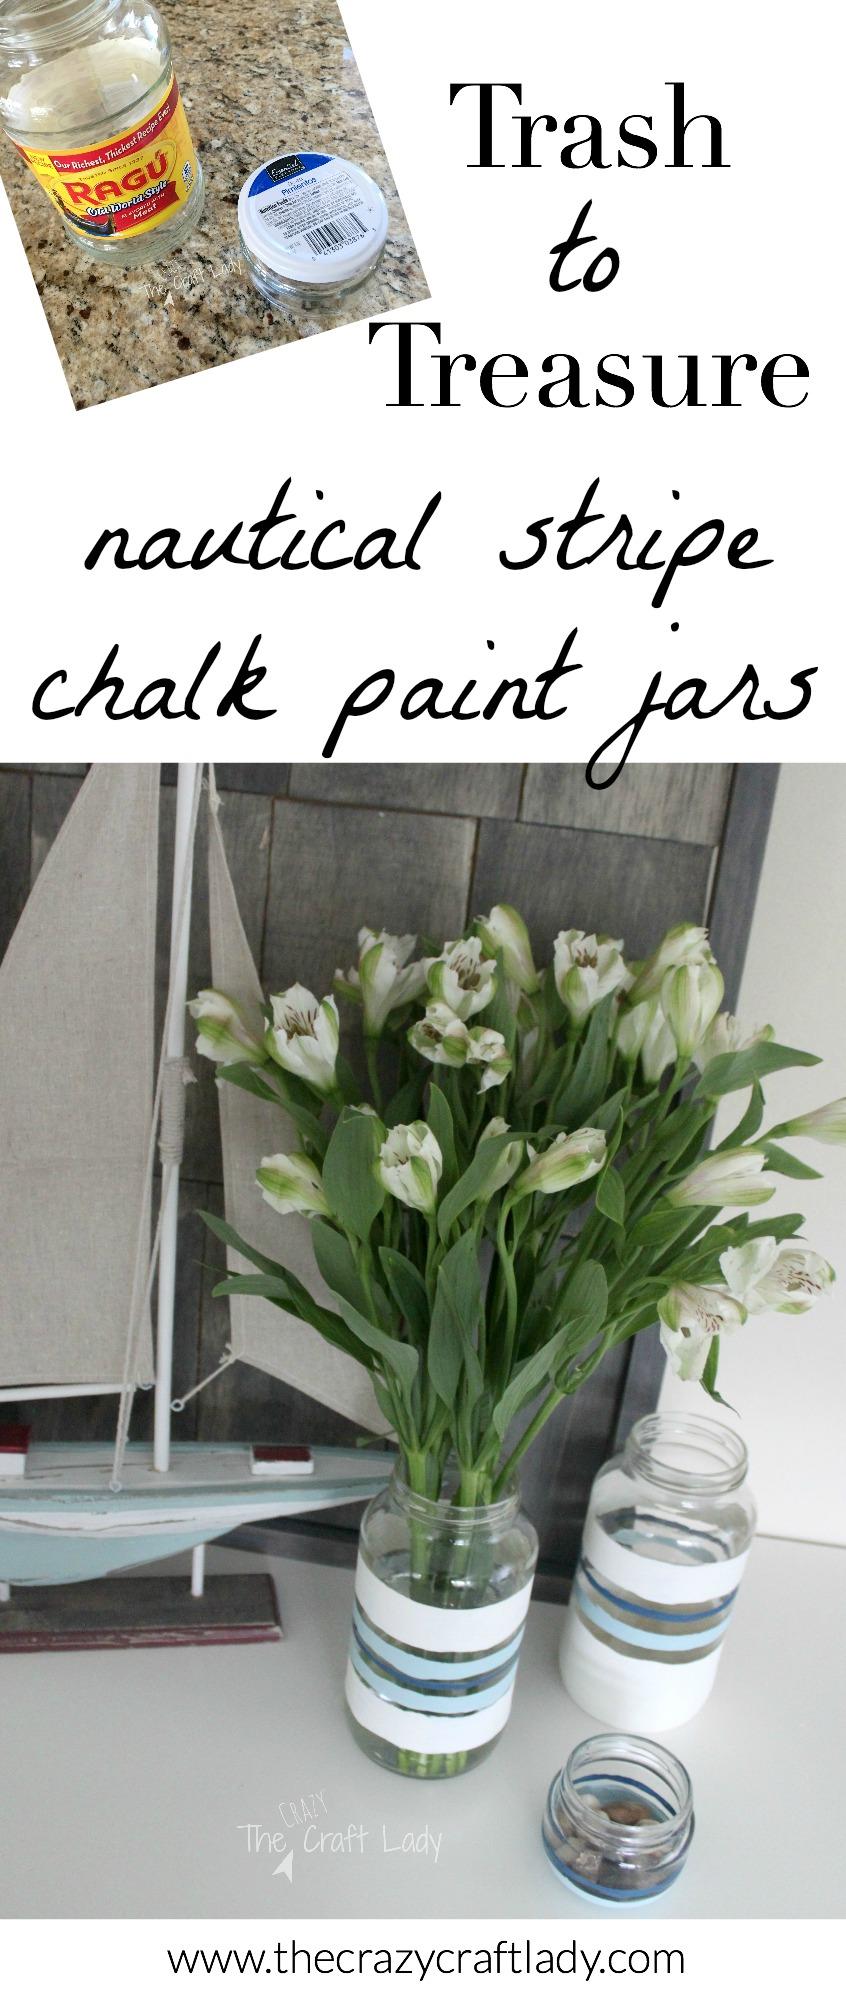 nautical stripe chalk painted jars the crazy craft lady. Black Bedroom Furniture Sets. Home Design Ideas